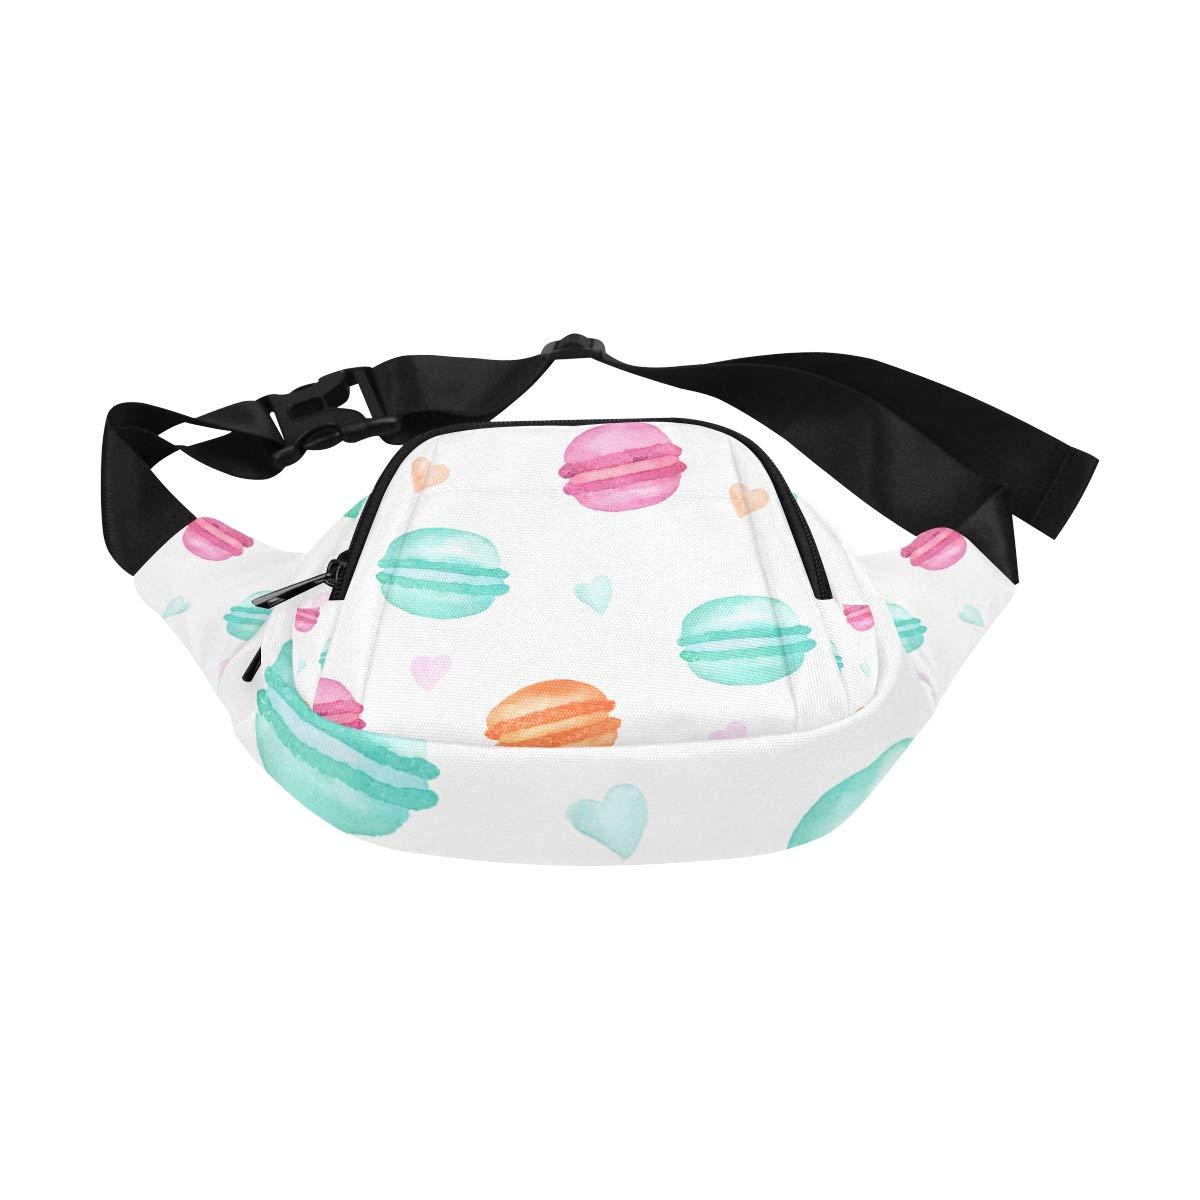 French Sweets Handdrawn Macaroon Fenny Packs Waist Bags Adjustable Belt Waterproof Nylon Travel Running Sport Vacation Party For Men Women Boys Girls Kids